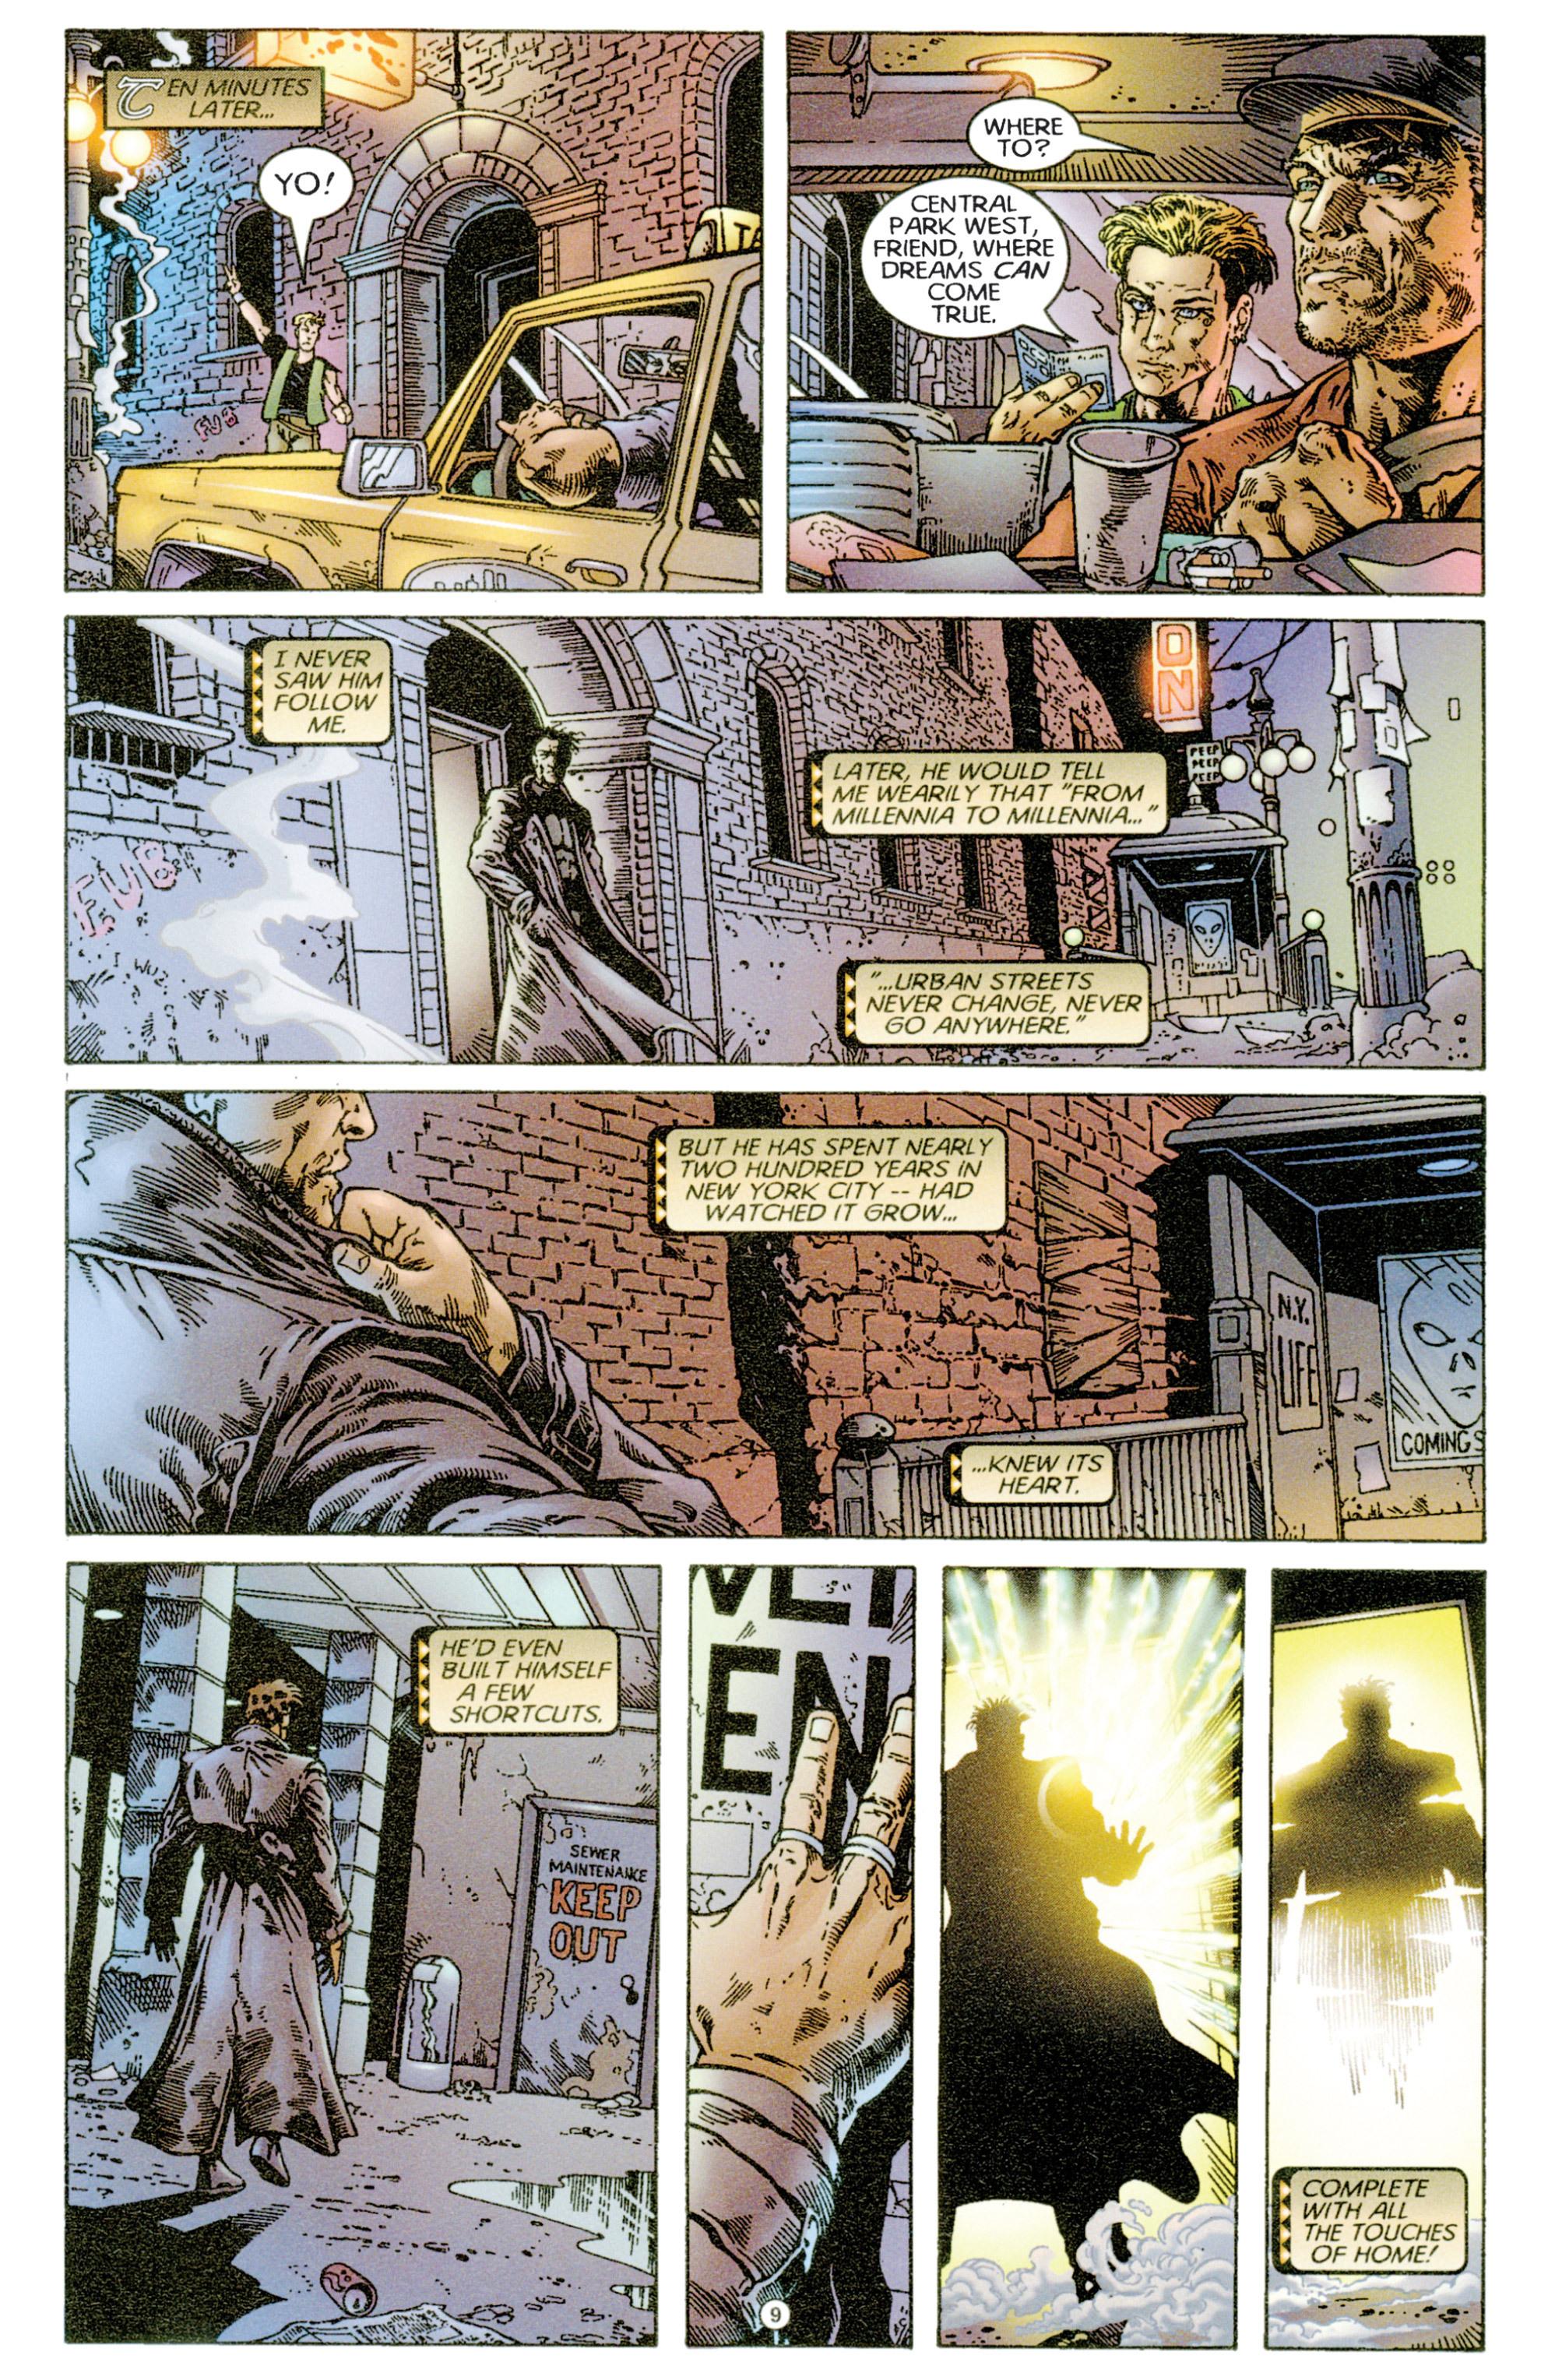 Read online Eternal Warriors comic -  Issue # Issue Time & Treachery - 9